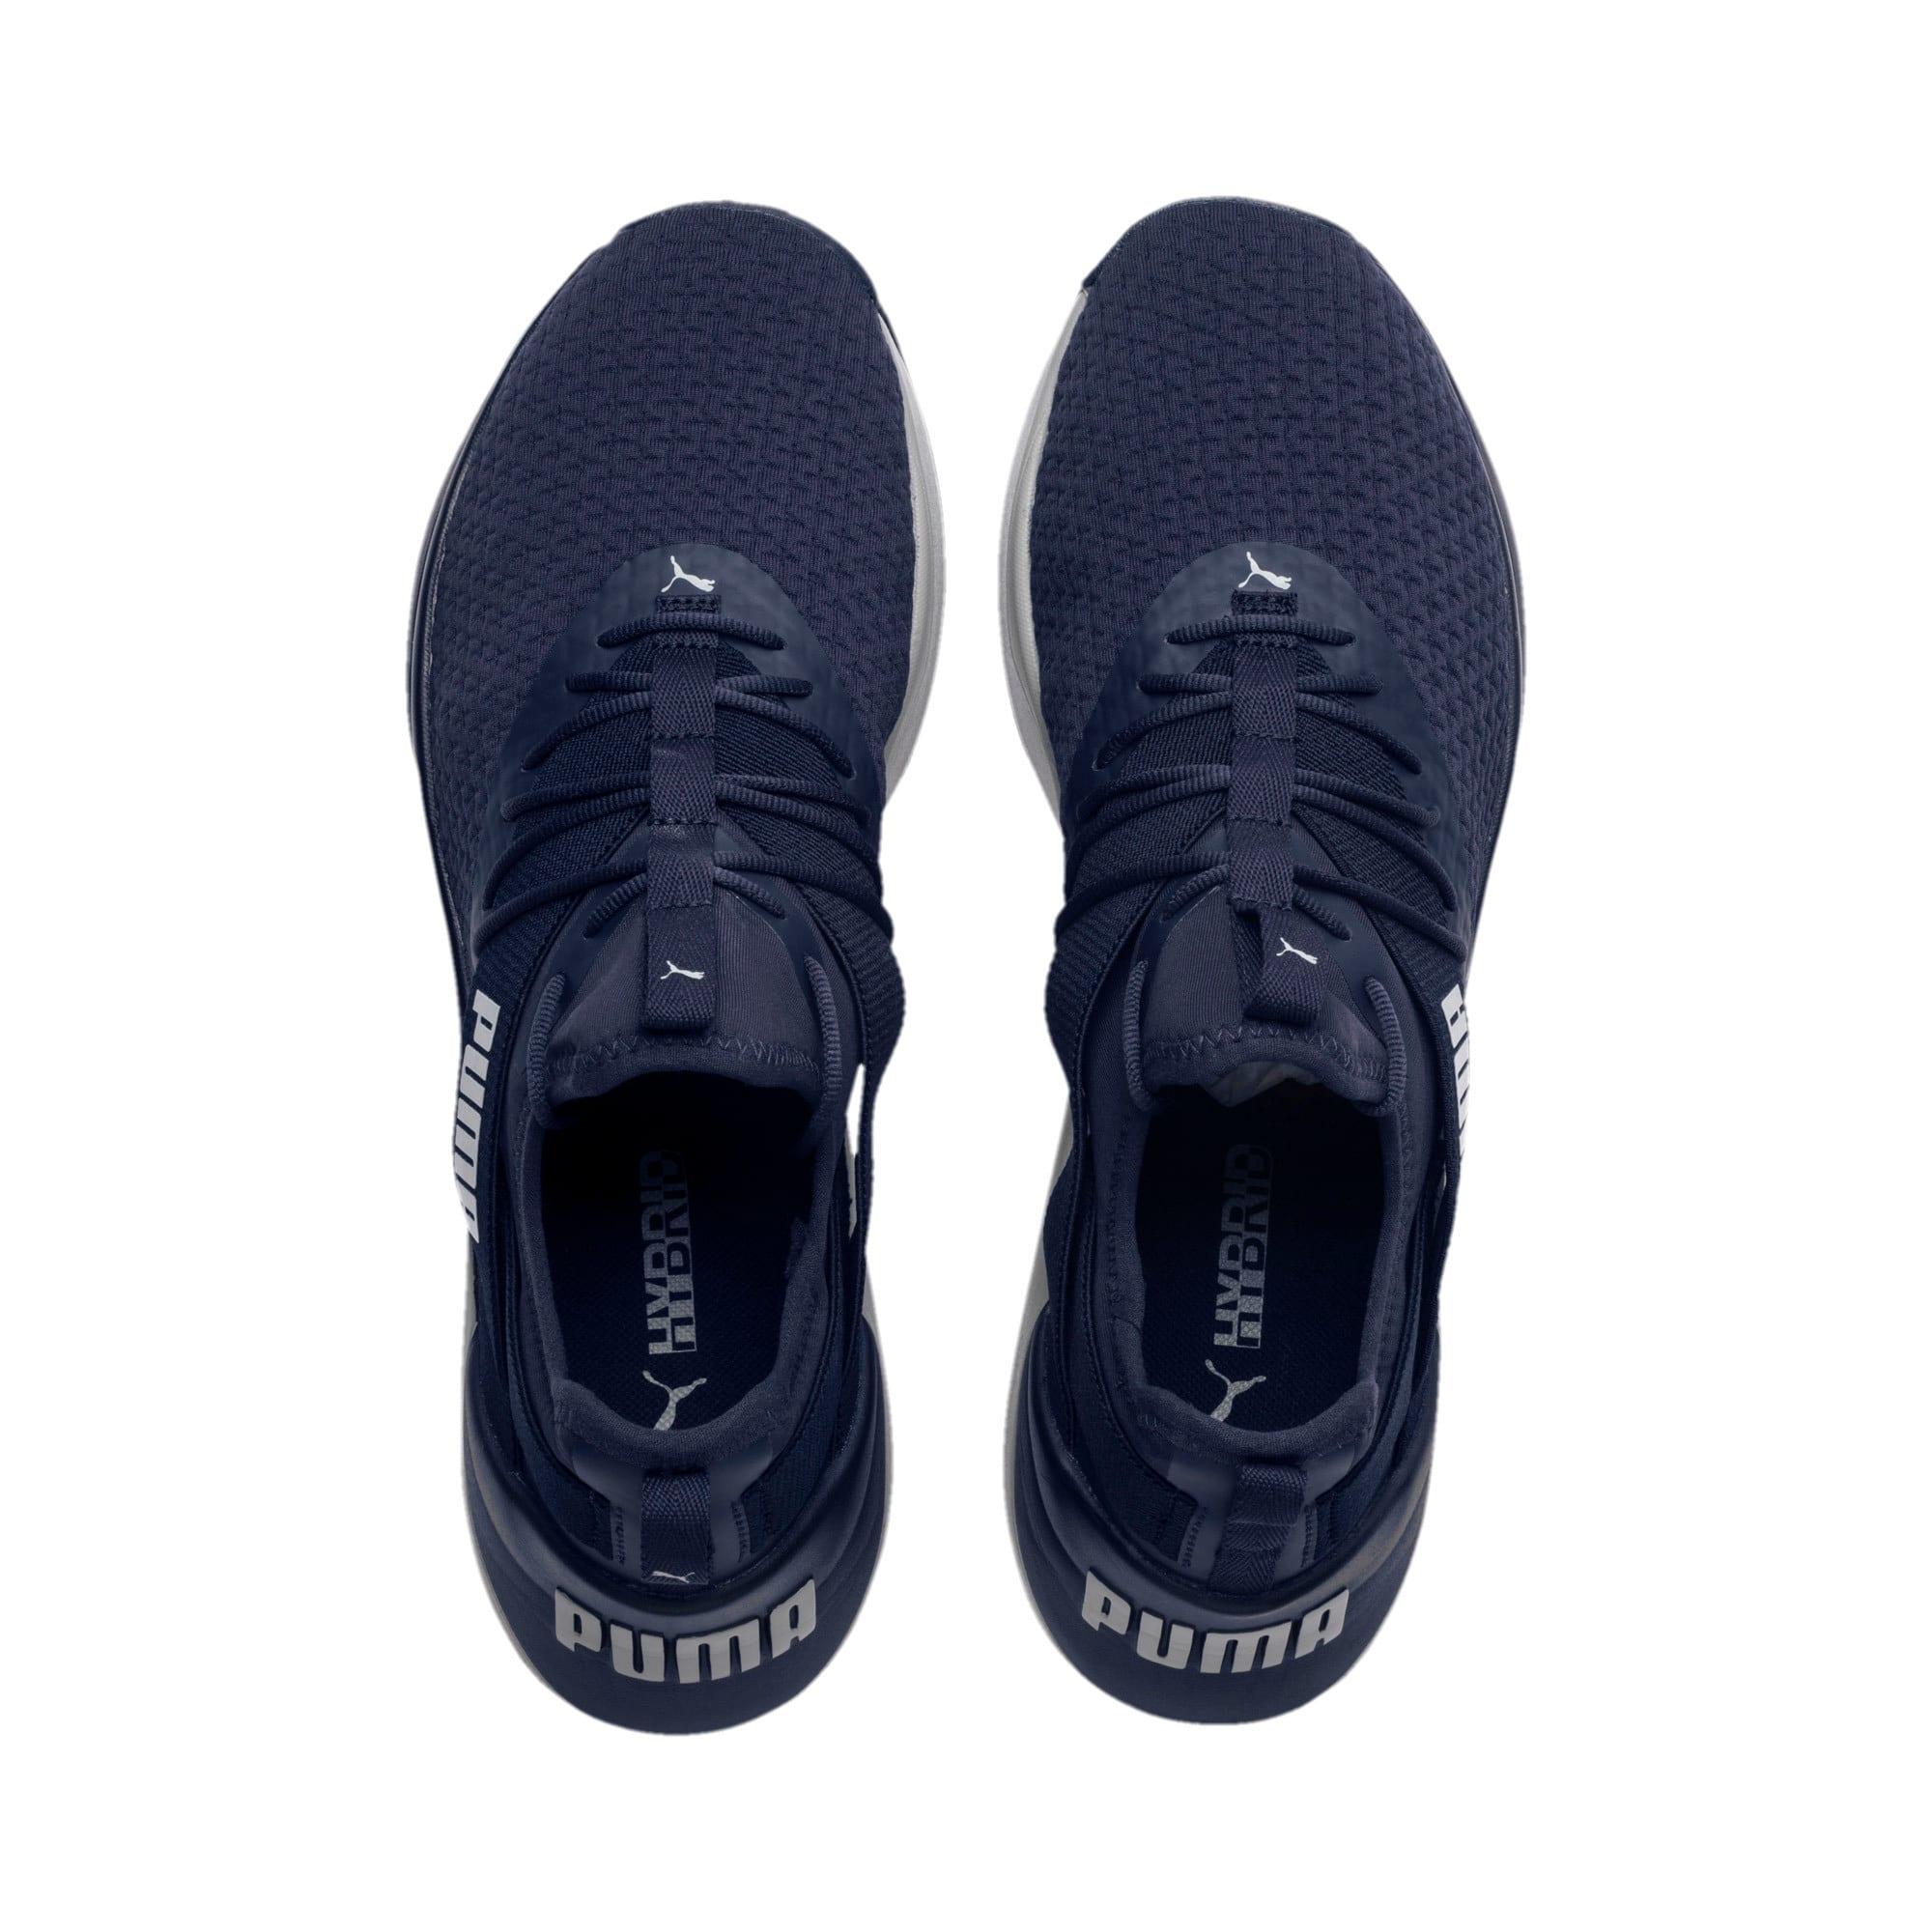 Thumbnail 6 of Jaab XT Men's Training Shoes, Peacoat-Quarry, medium